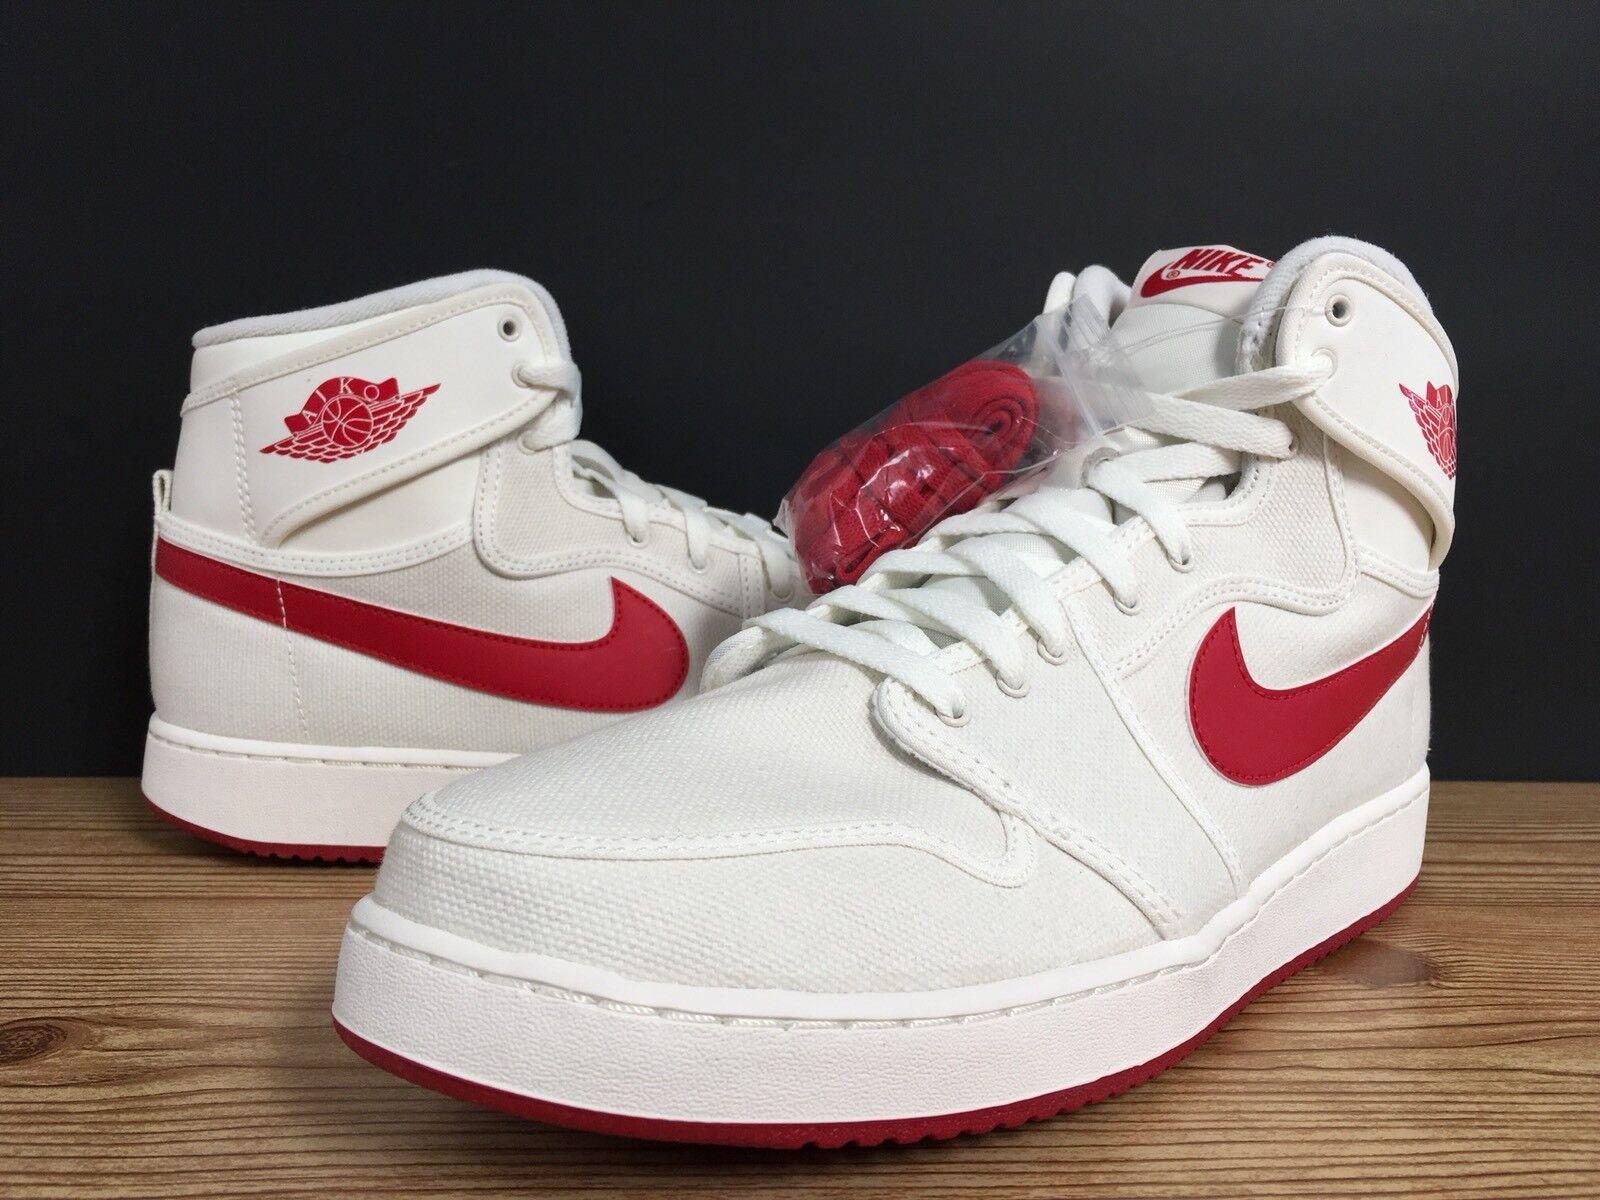 Nike Air Jordan 1 KO AJKO High OG sail red white size 13 638471-102 Retro